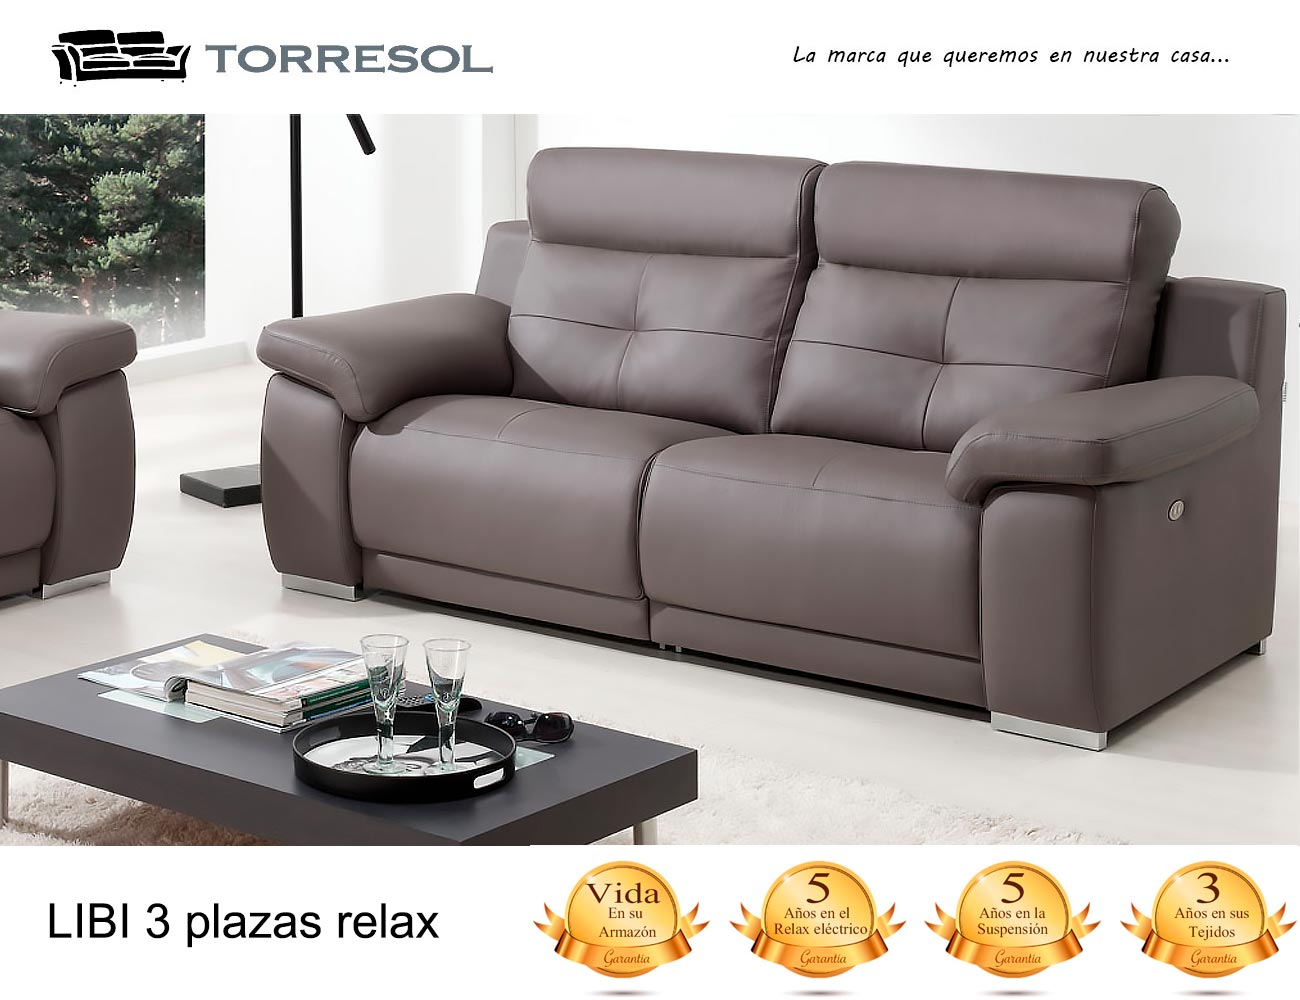 Sofa libi torresol en piel chocolate 31